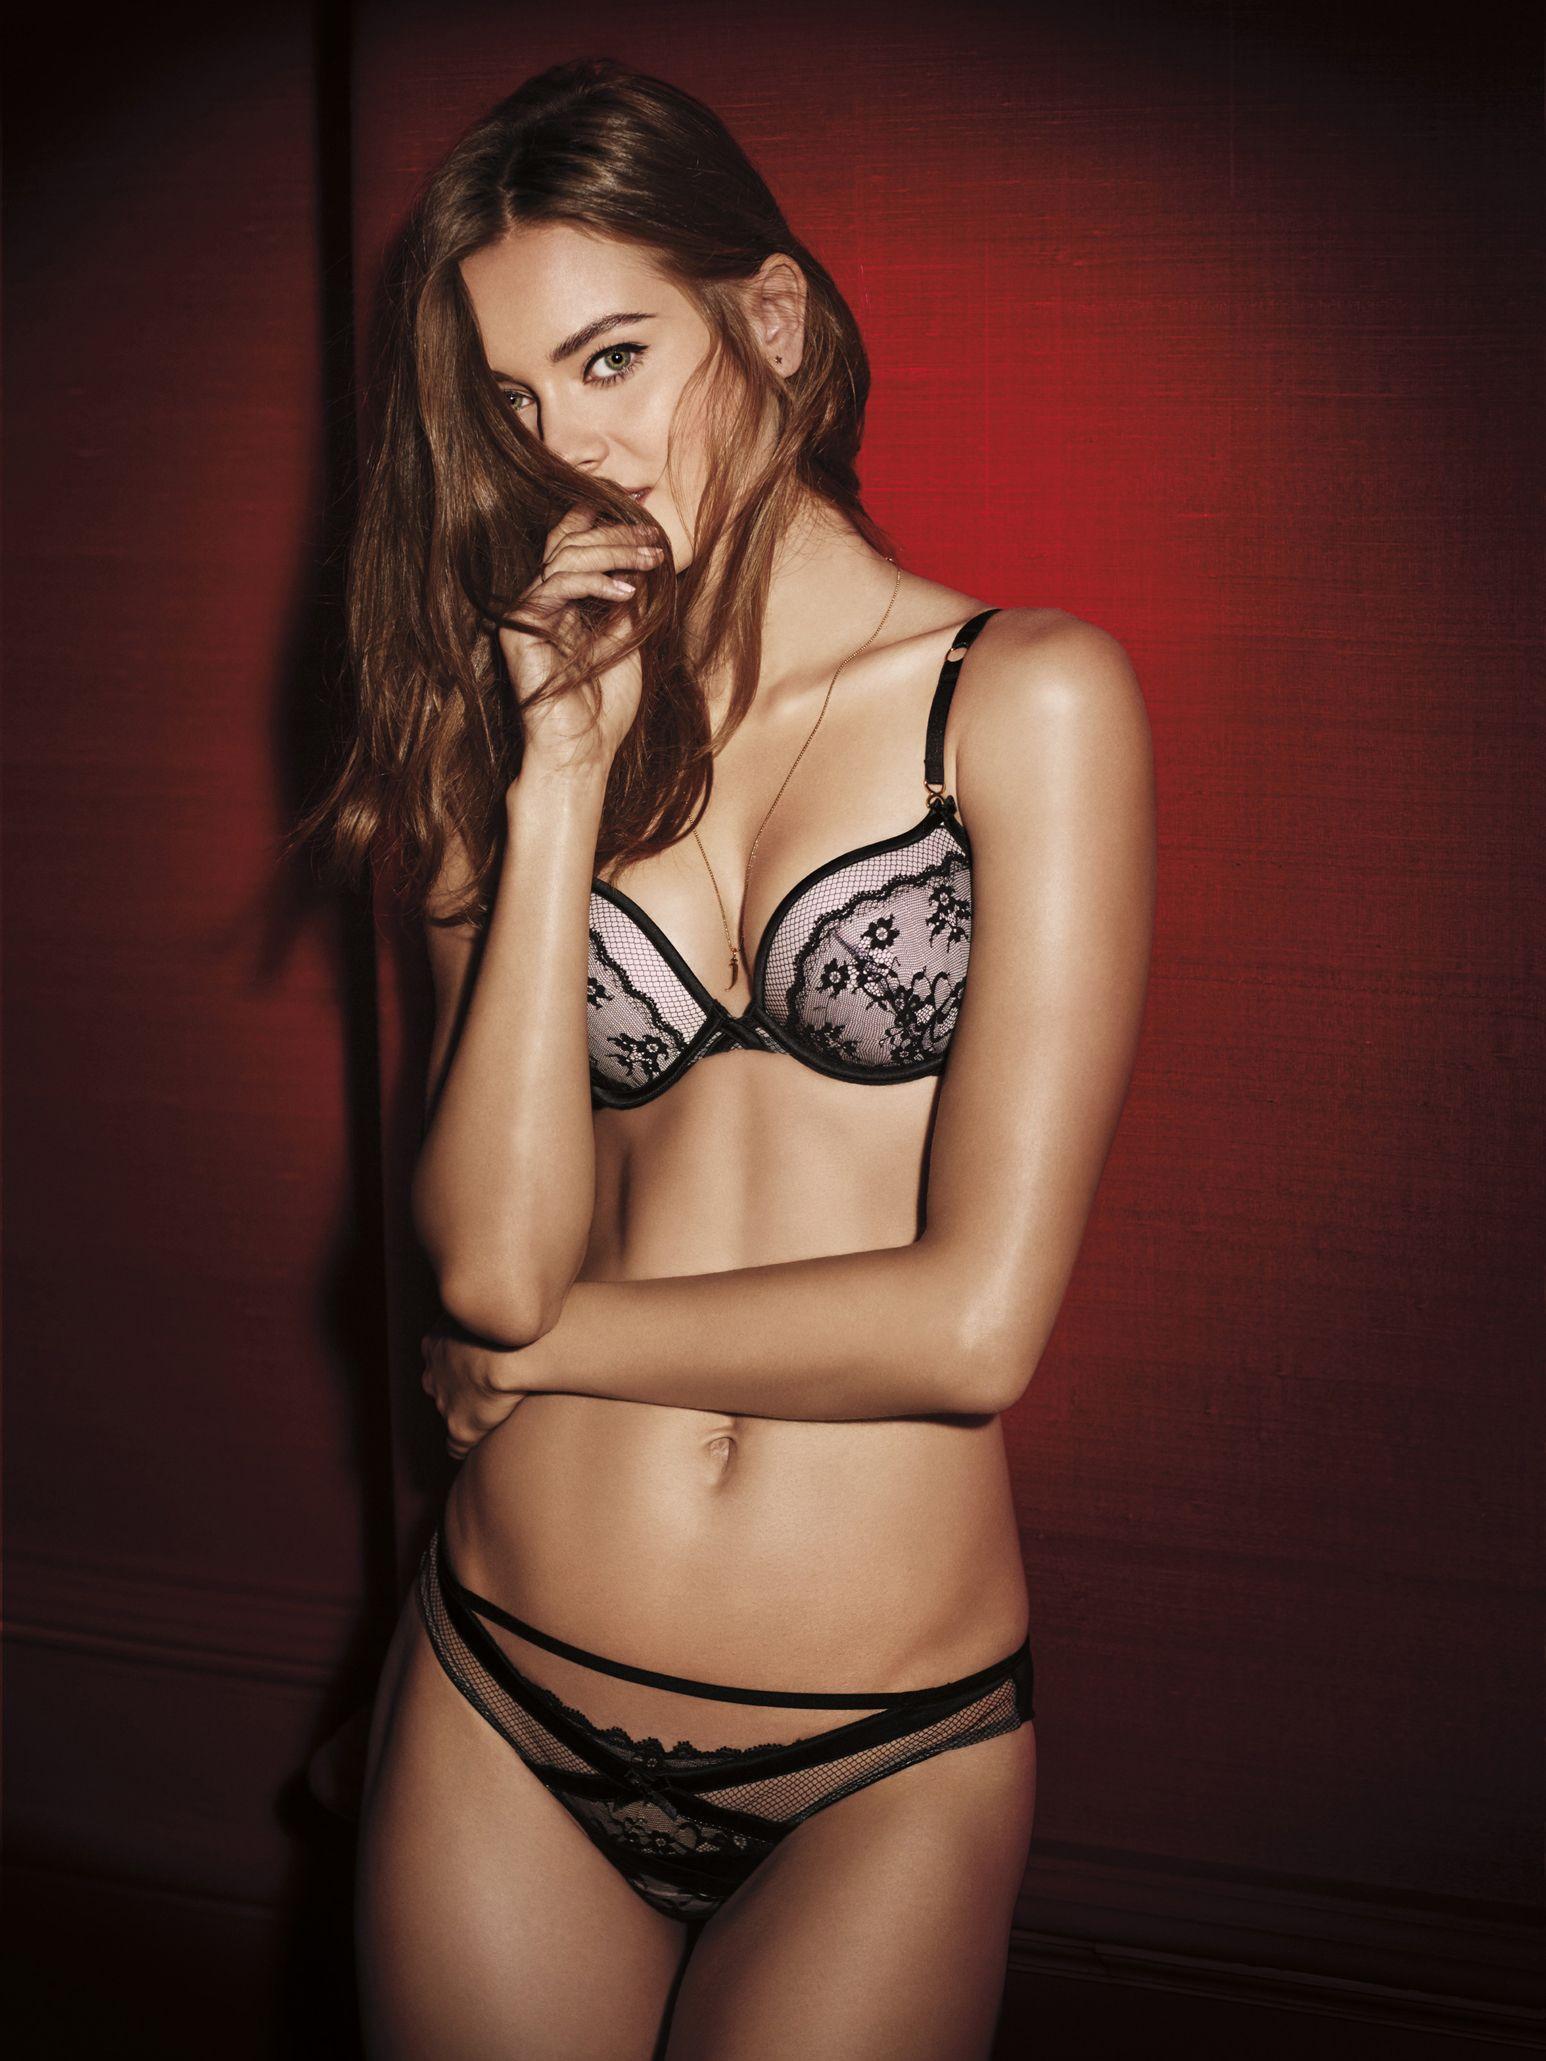 Brea grant tits nude (11 images)